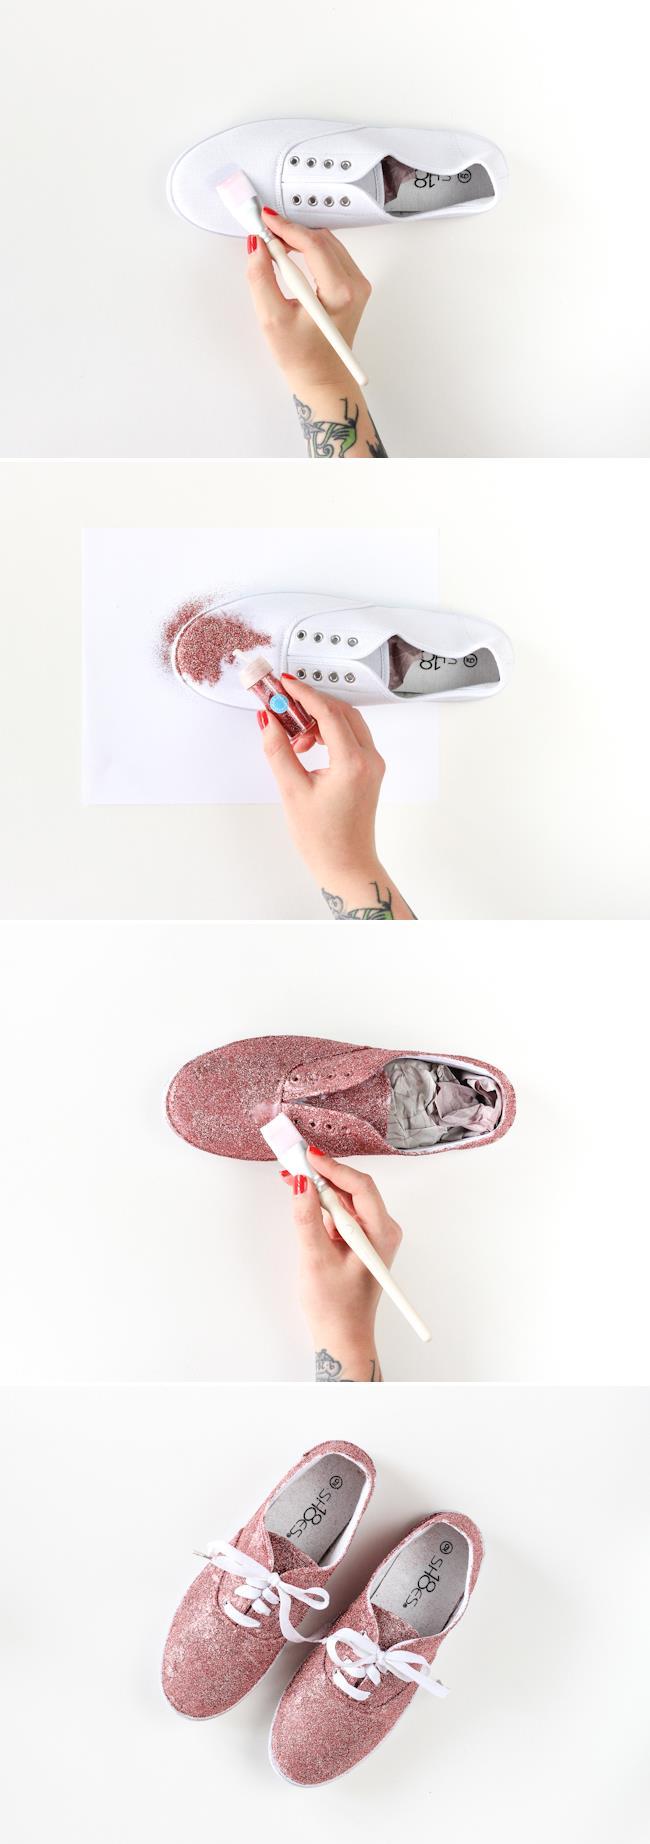 I vari step per applicare i glitter sulle scarpe